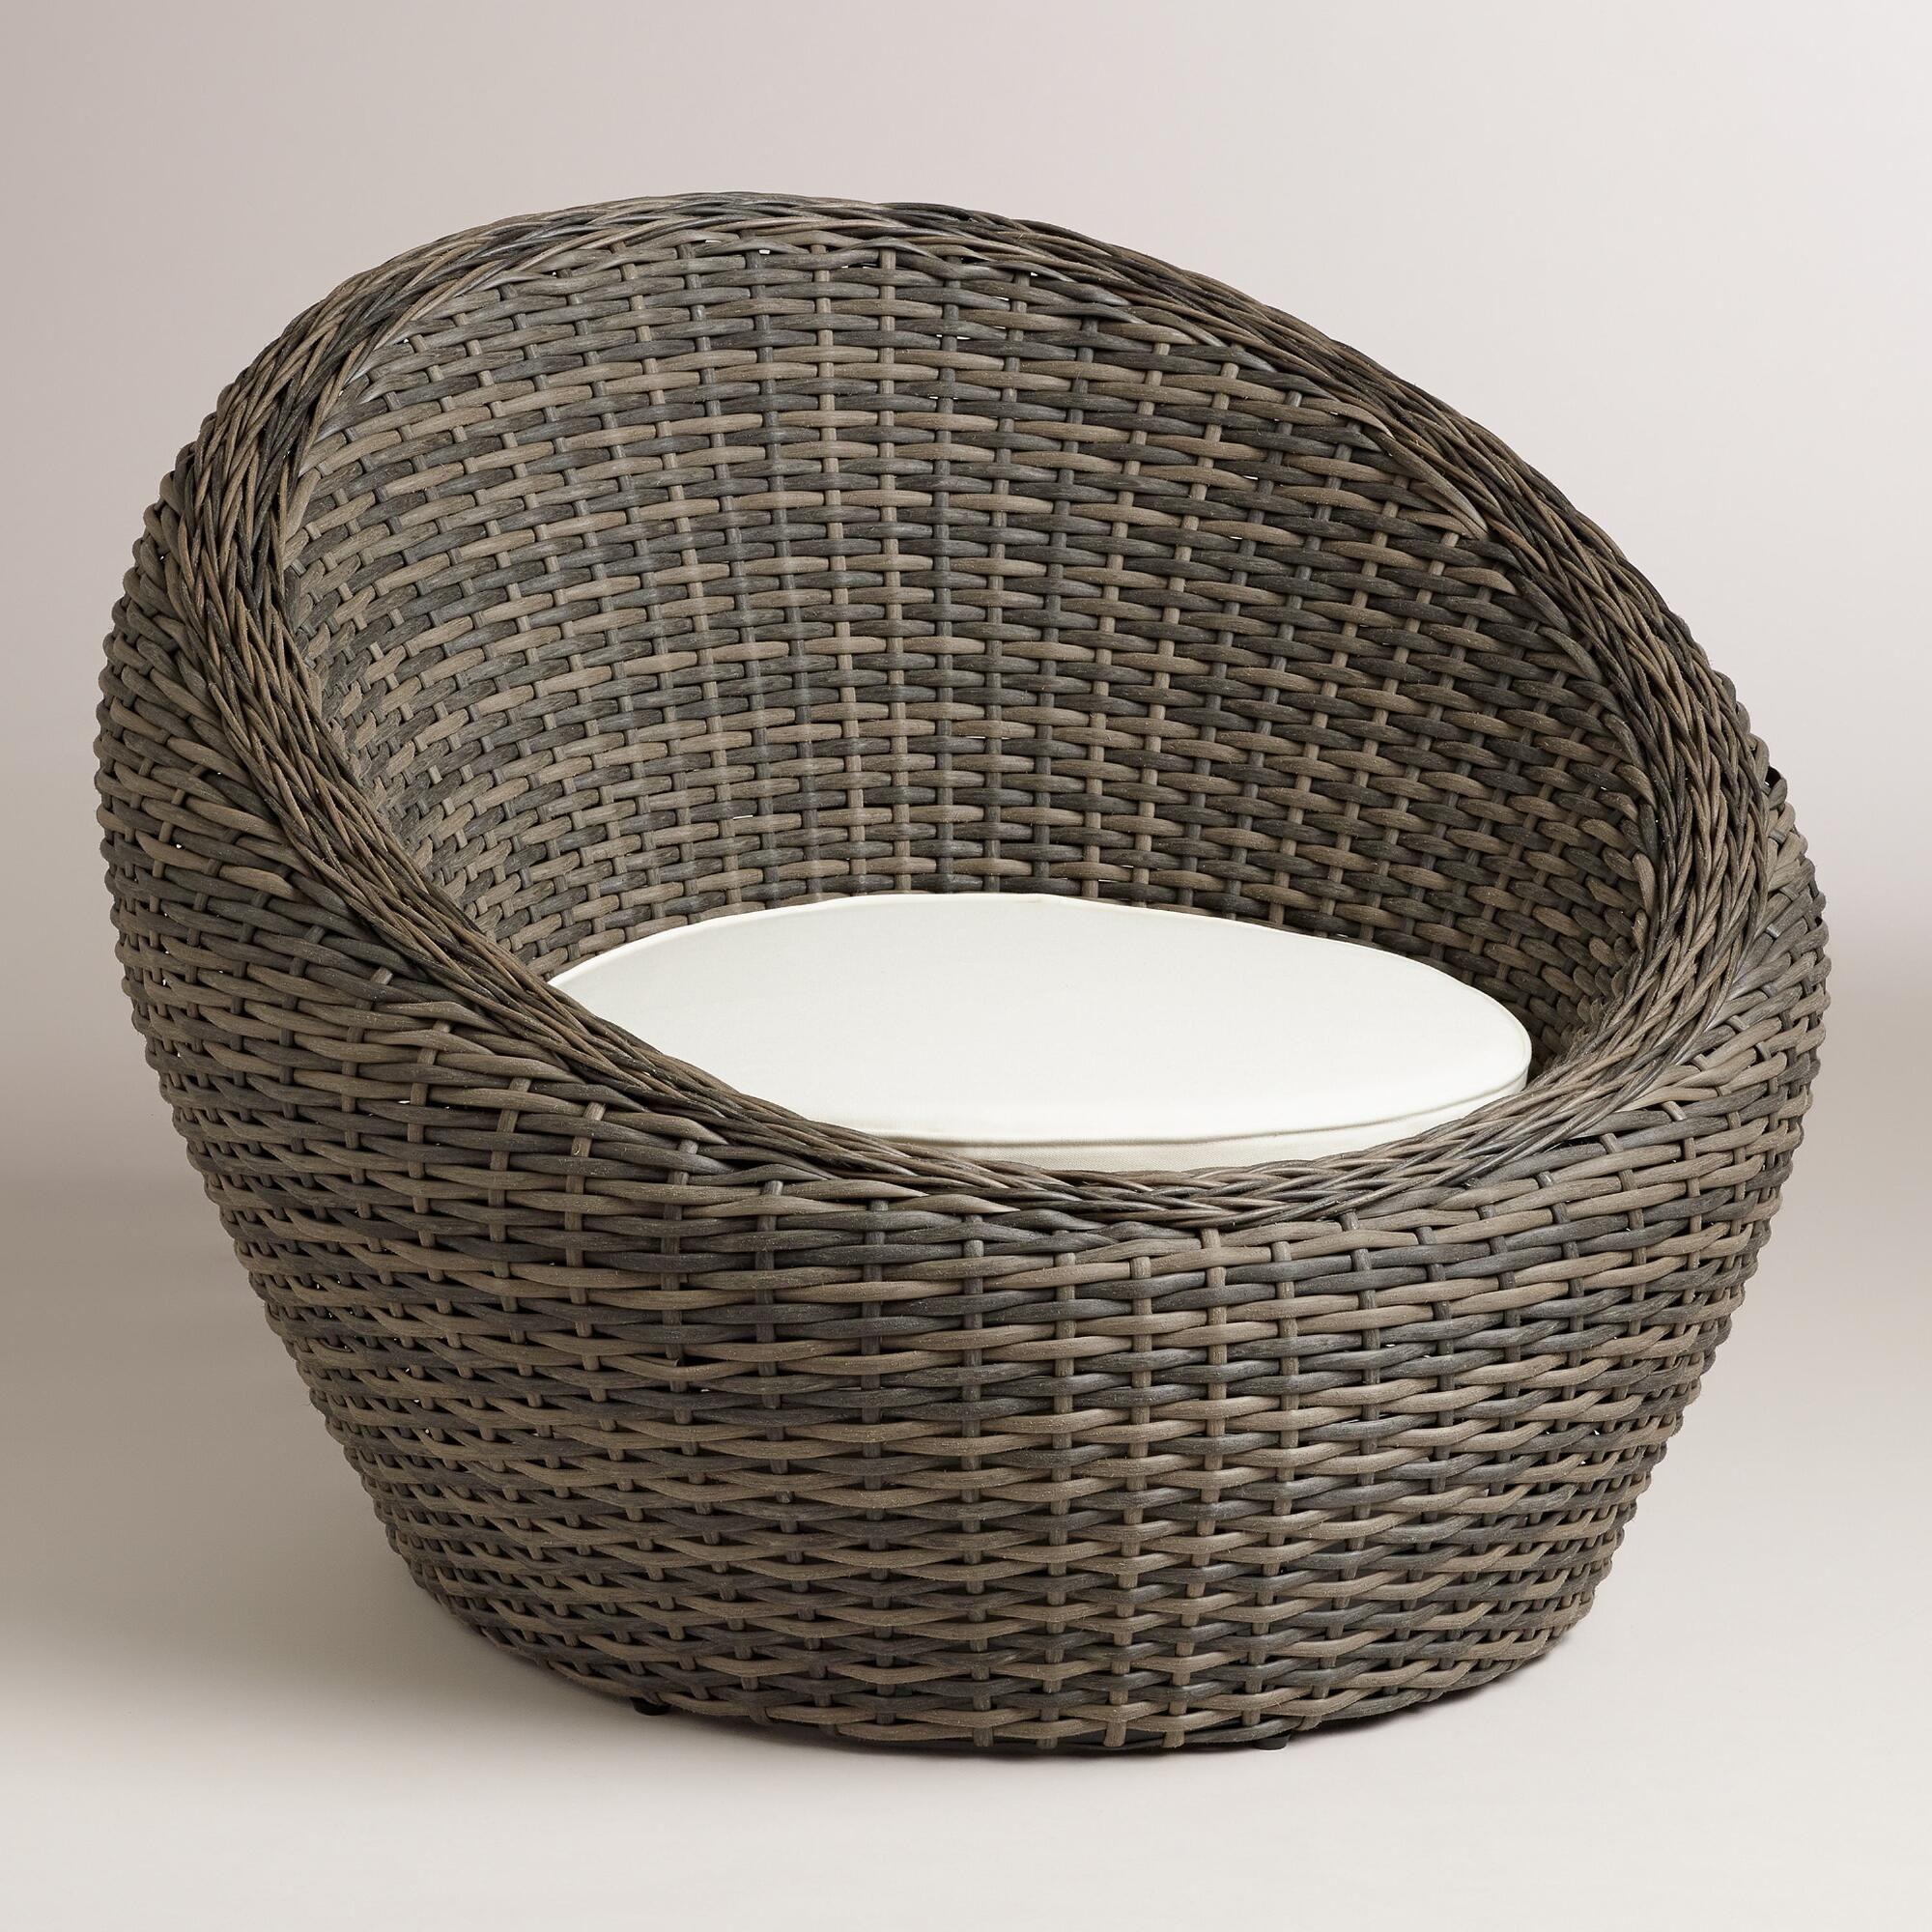 Stupendous With A Comfortable Cushion Our Round Chair Is A Unique Frankydiablos Diy Chair Ideas Frankydiabloscom